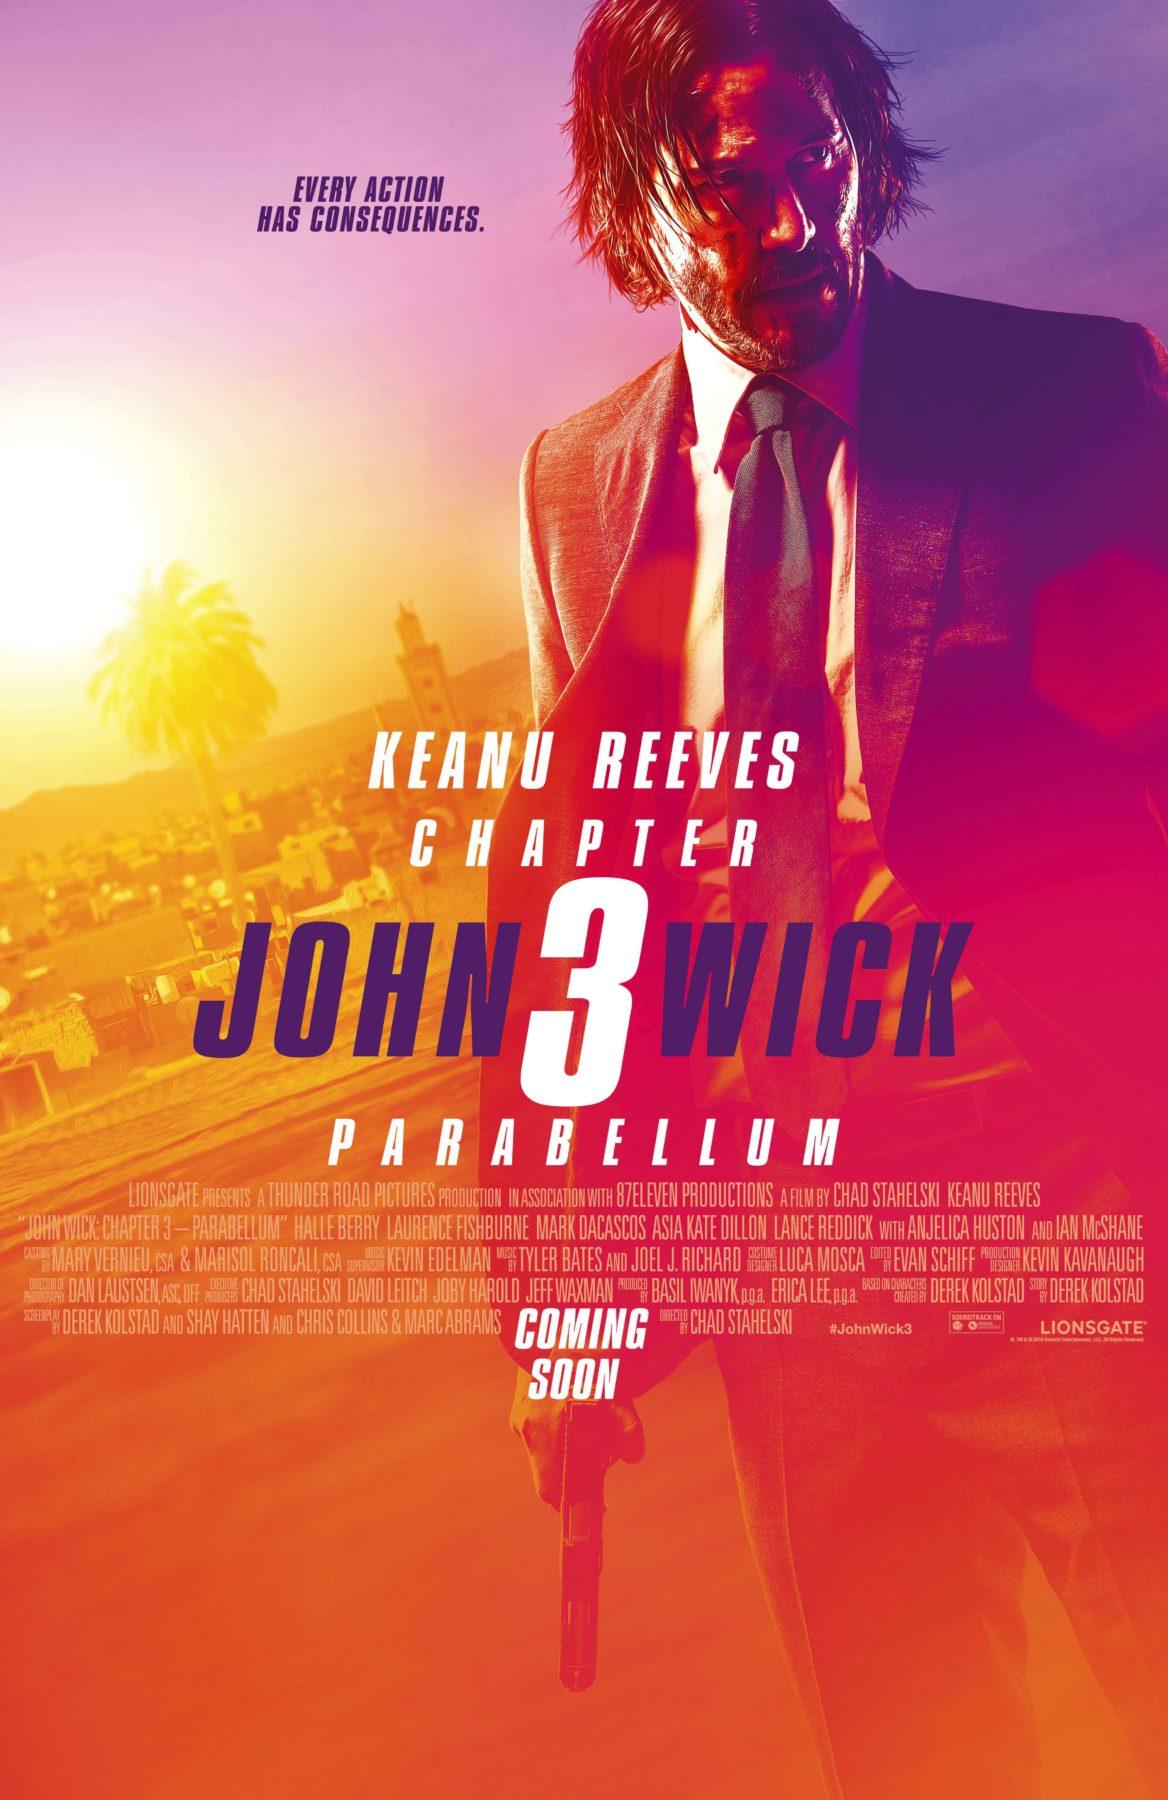 John-Wick-3